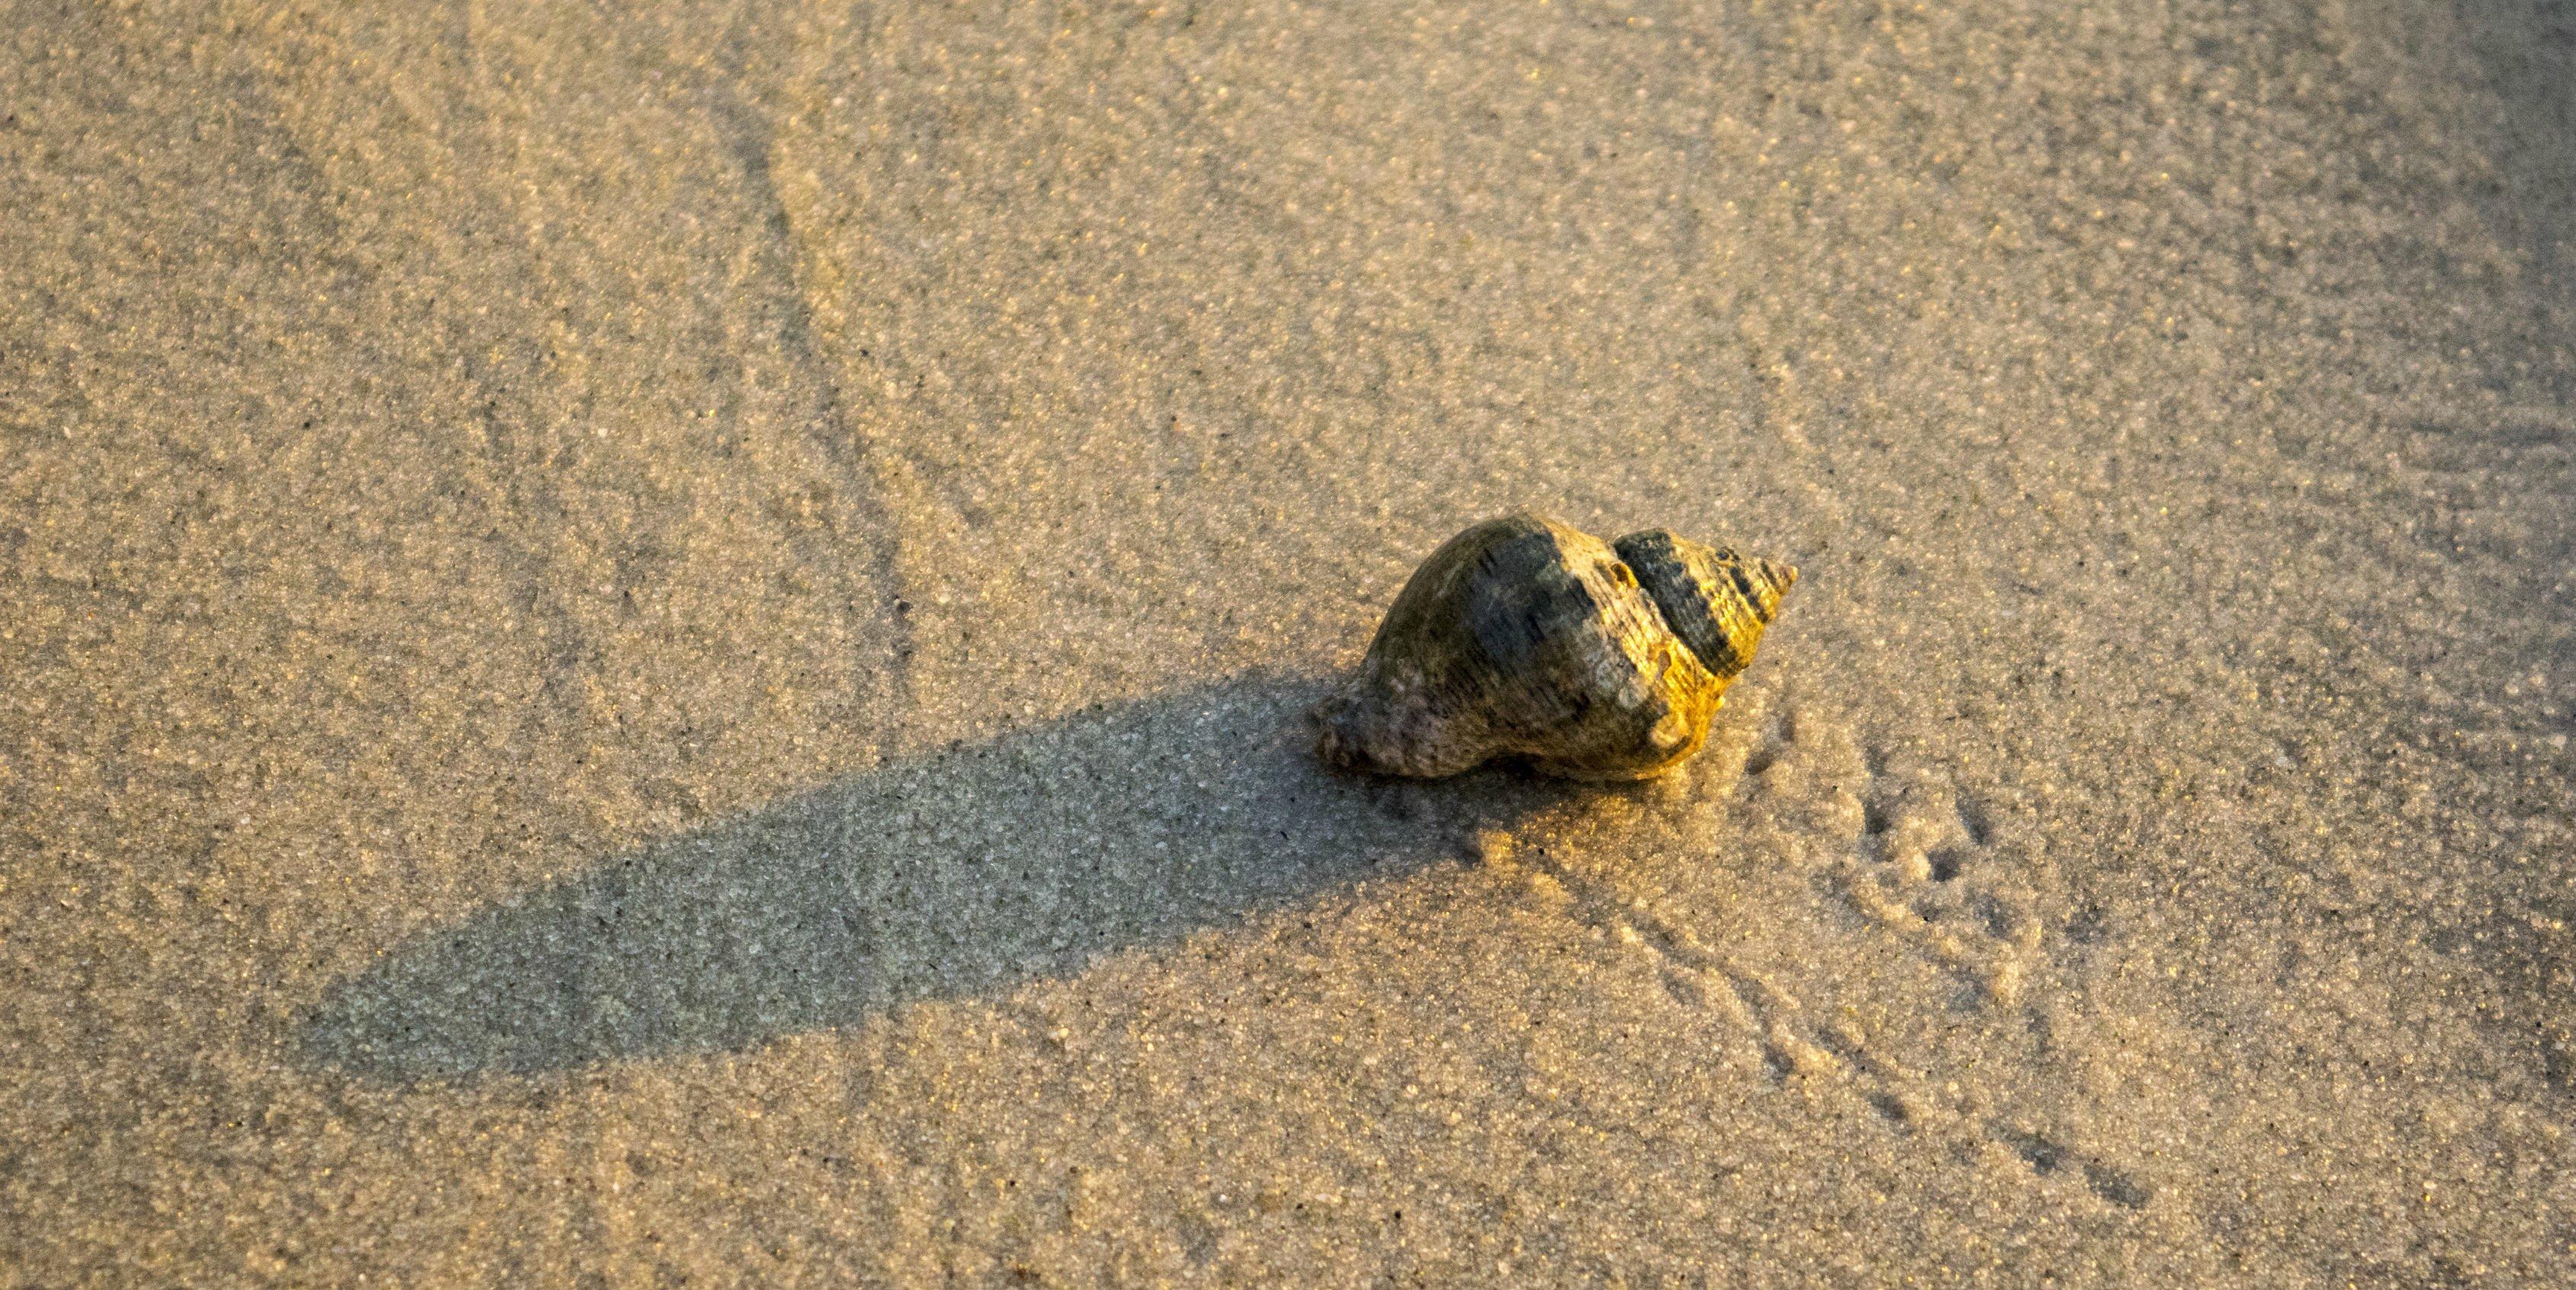 A hermit crab crawls across a beach   responsible travel